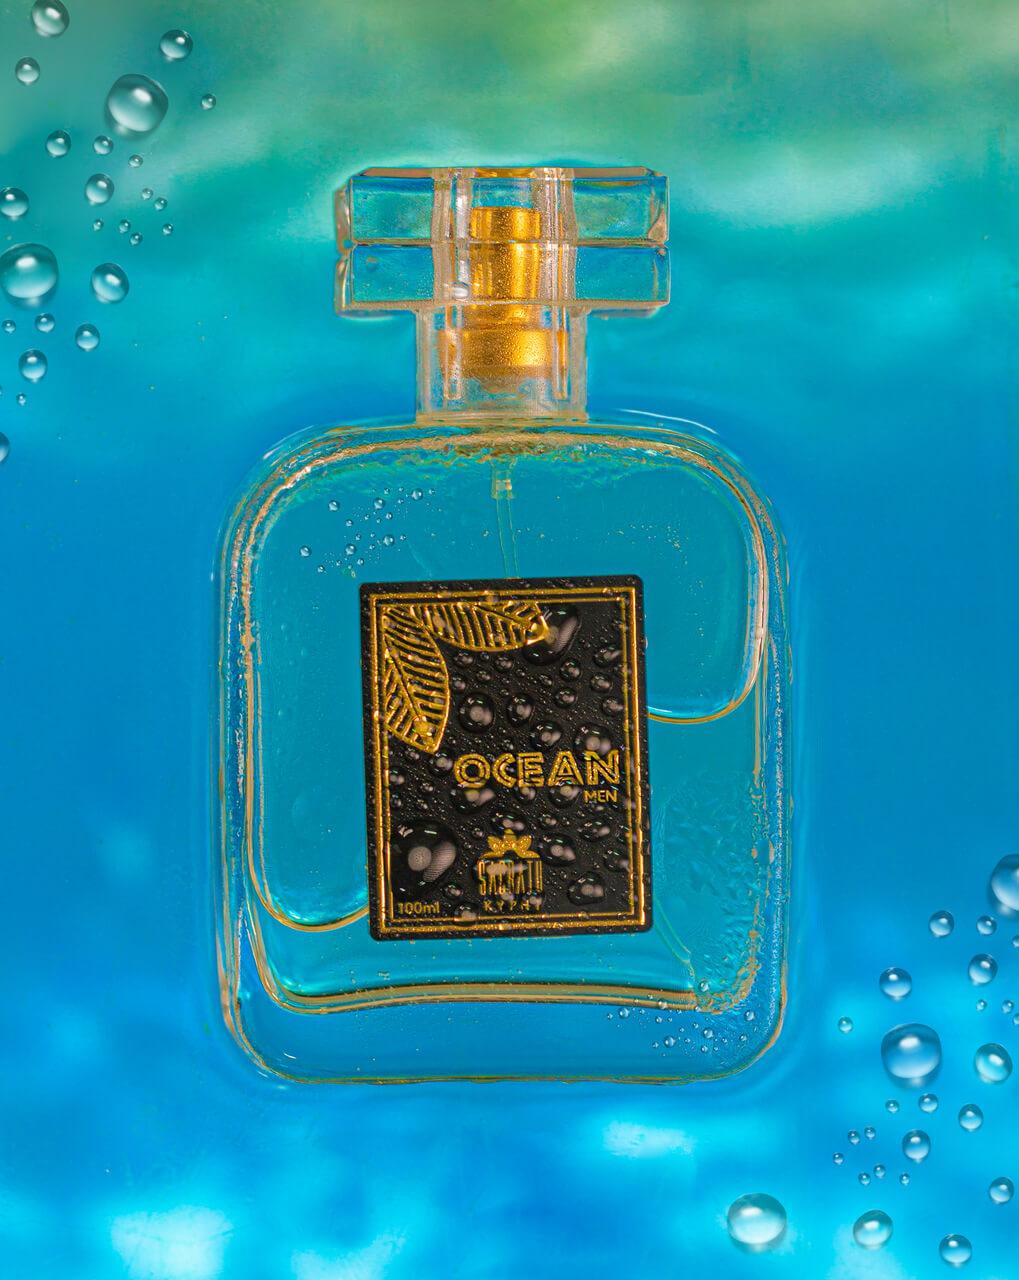 OCEAN Inspirado em  Bvlgari Aqva Pour Homme by Bvlgari